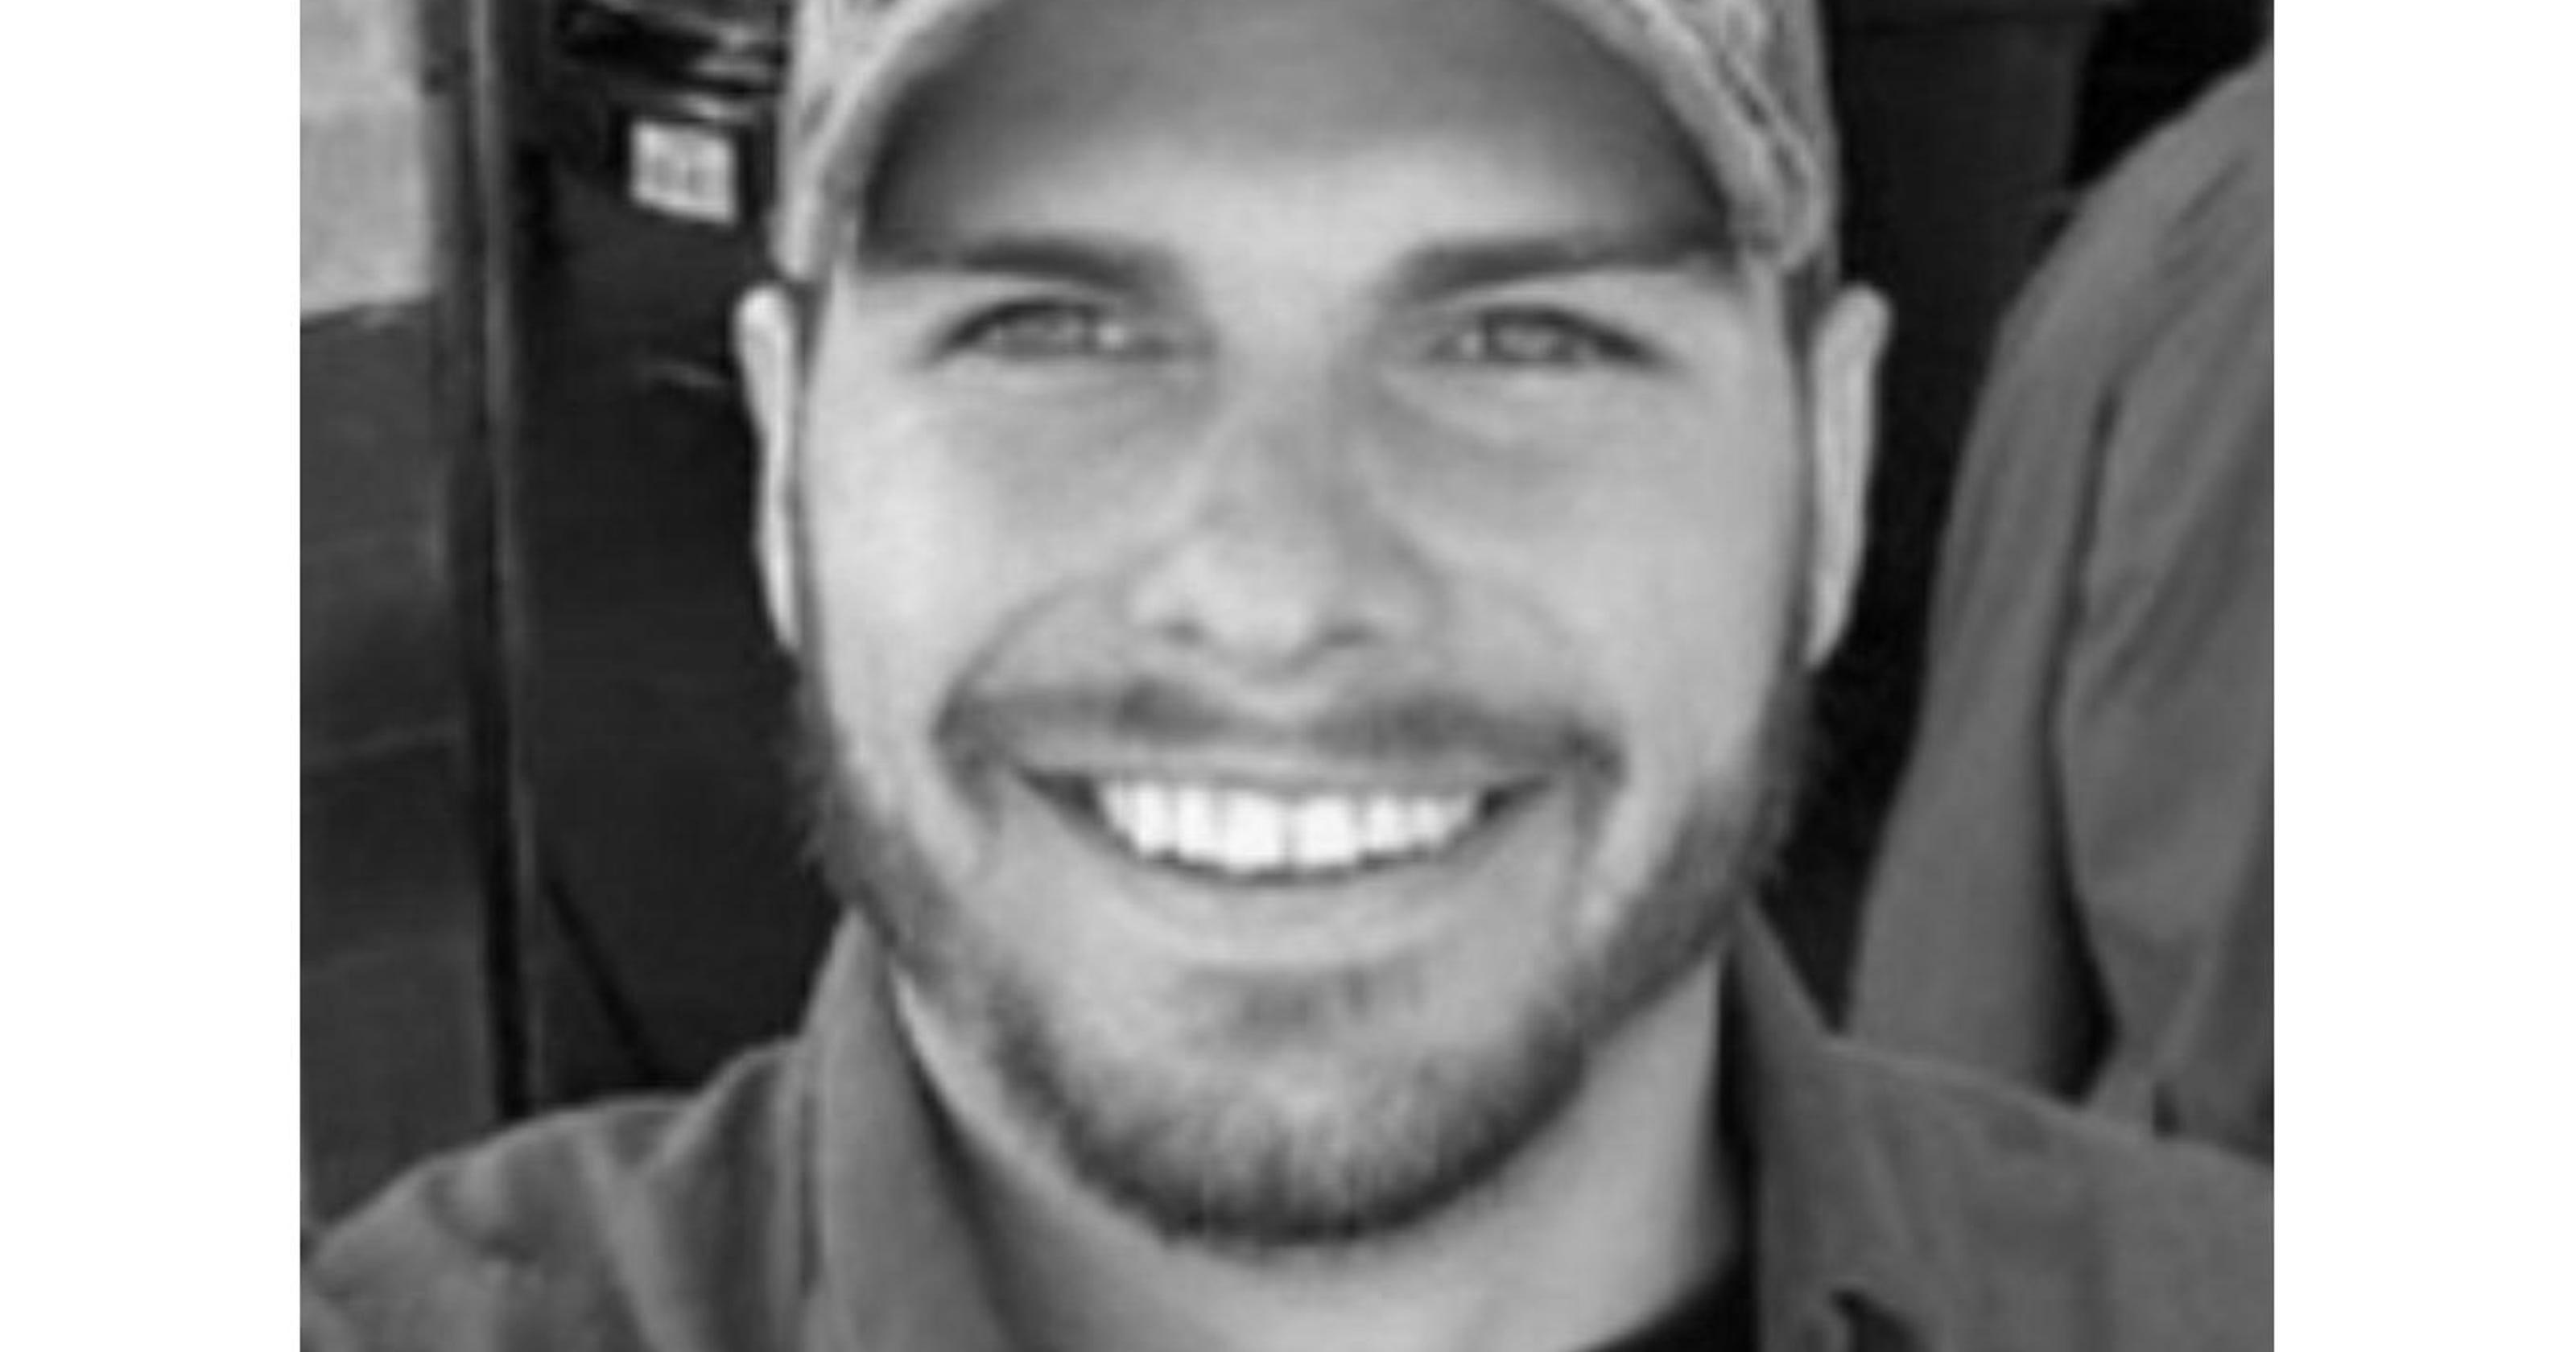 Aaron Blake Dillard